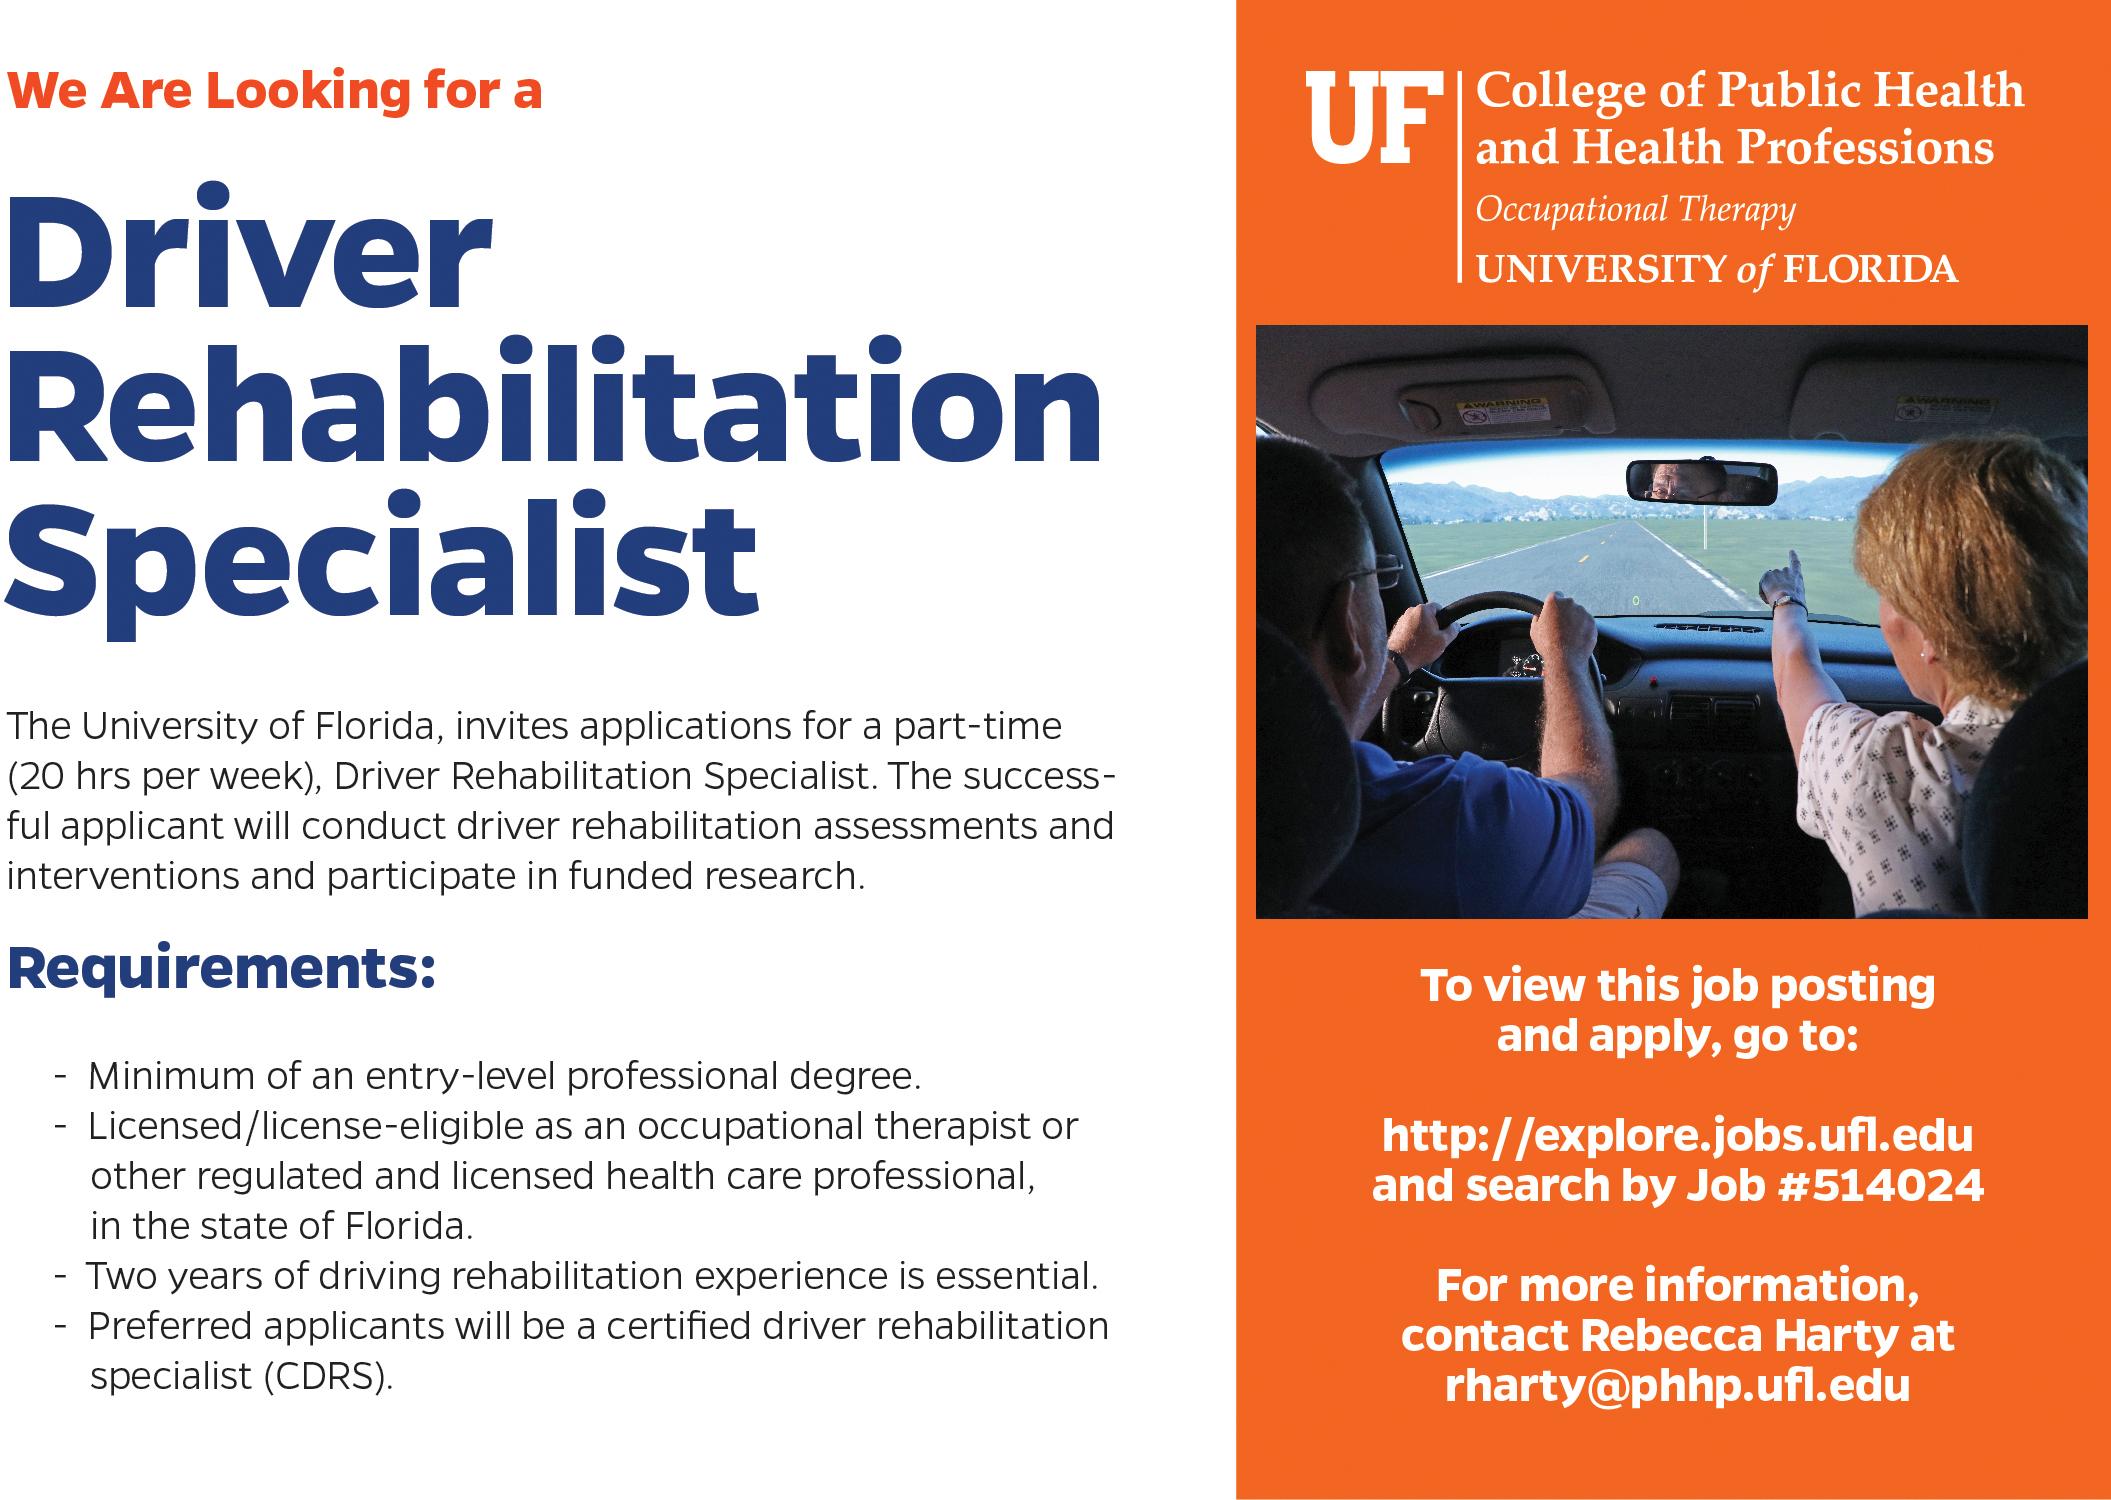 Driver Rehabilitation Specialist part-time job ad